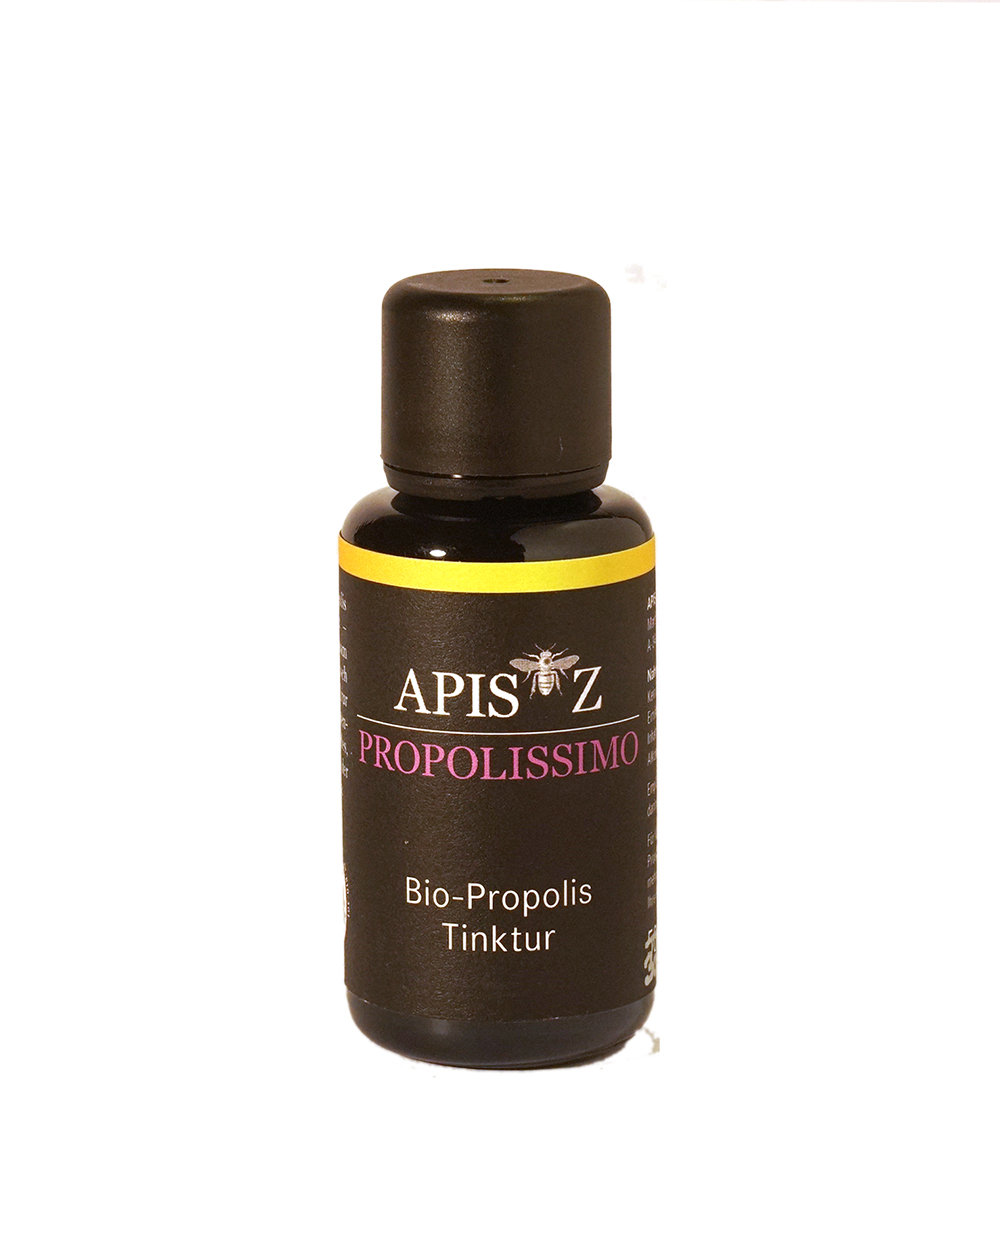 Bio-Propolis Tinktur